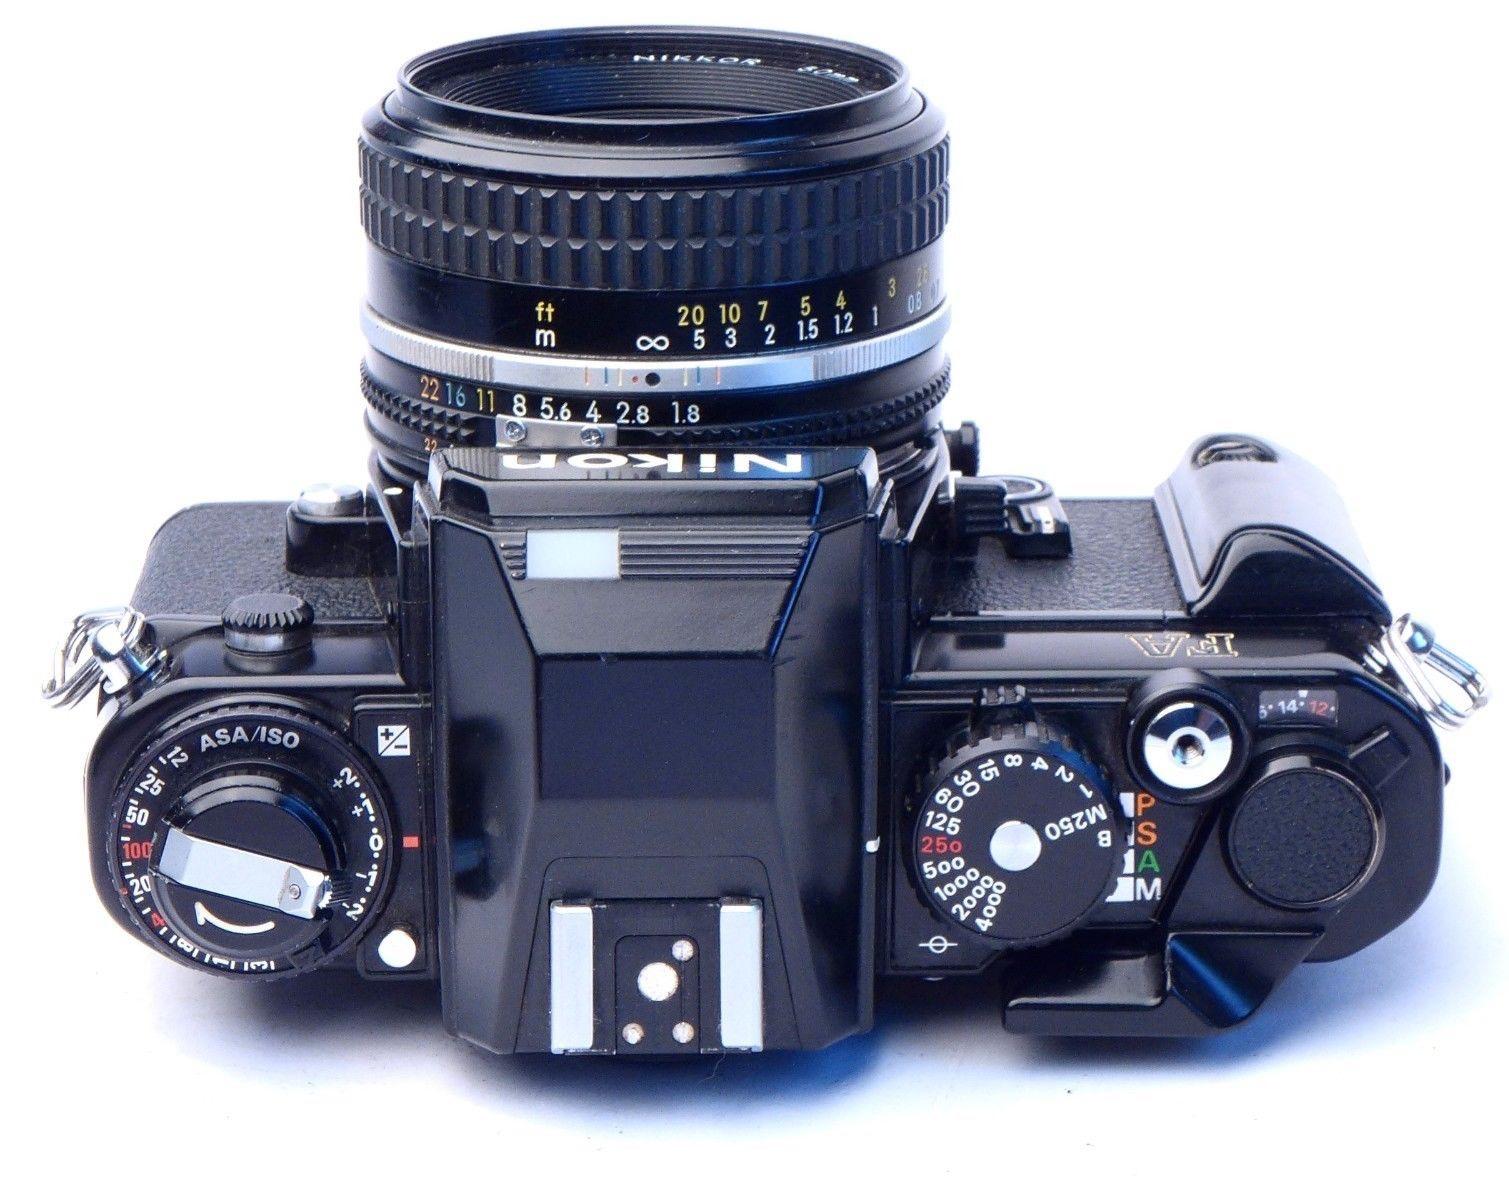 Top view of the Nikon FA